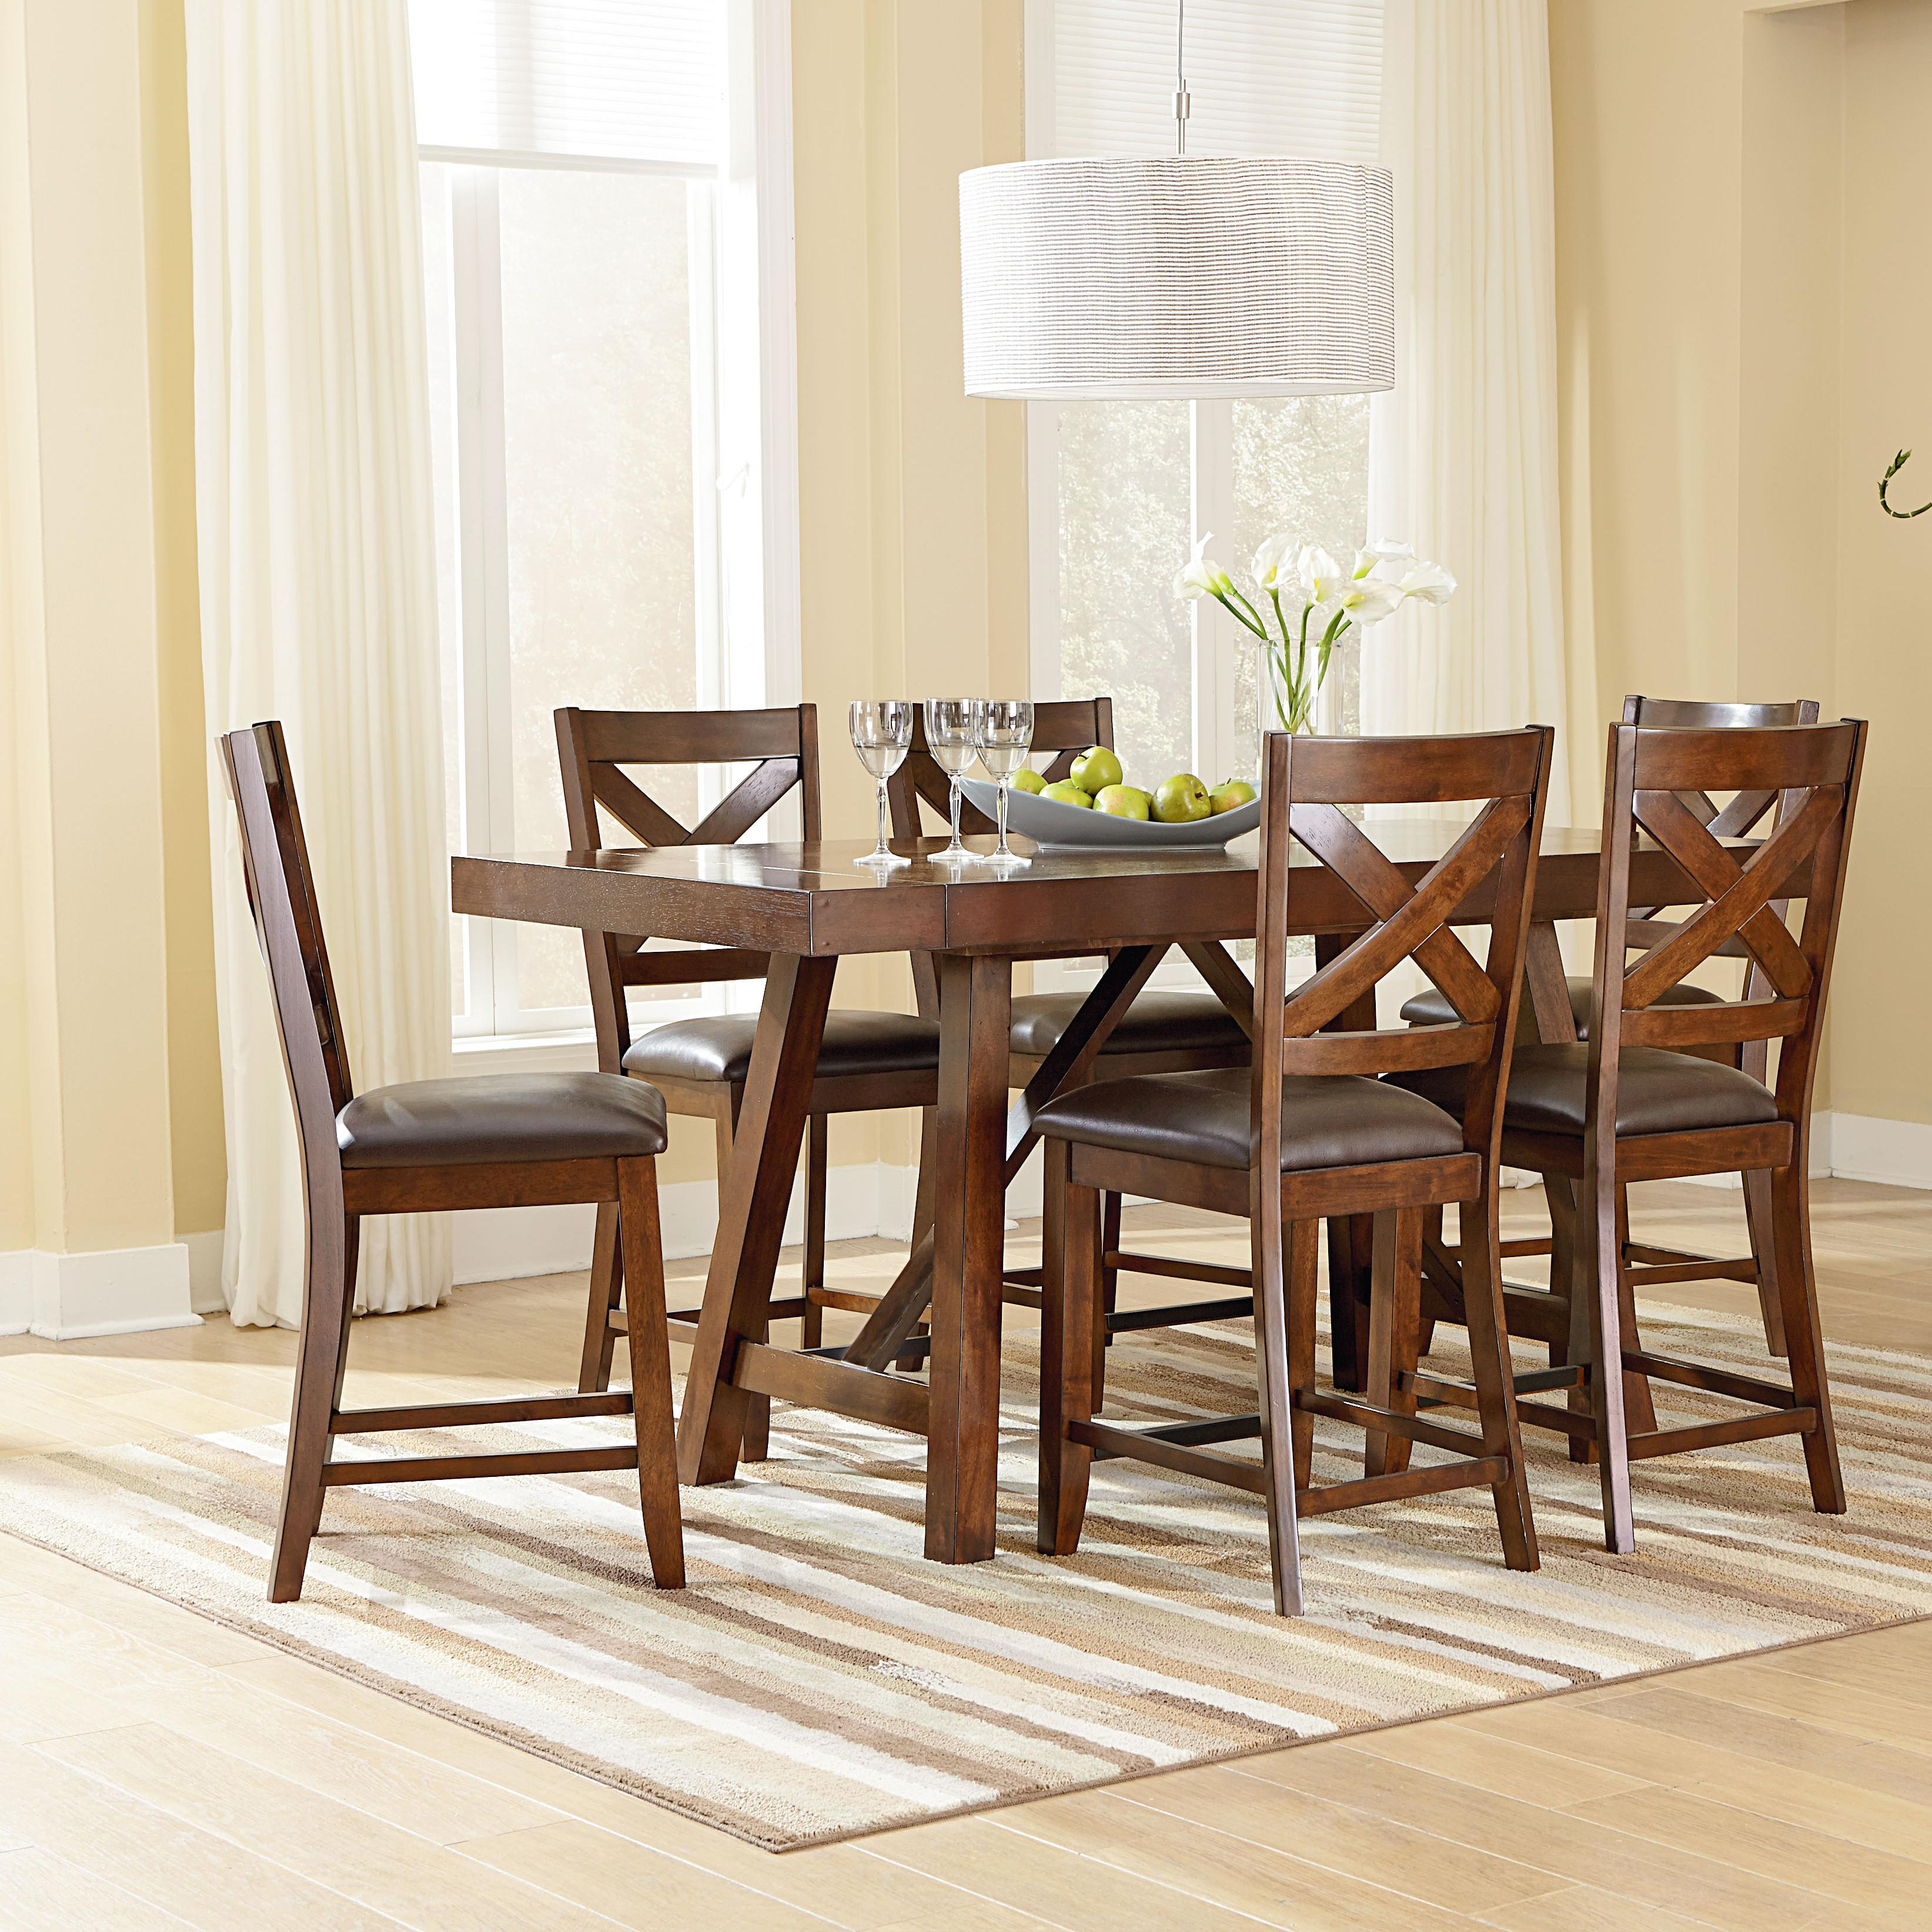 Outdoor Patio Furniture Omaha Ne: Standard Furniture Omaha Brown Counter Height 7 Piece